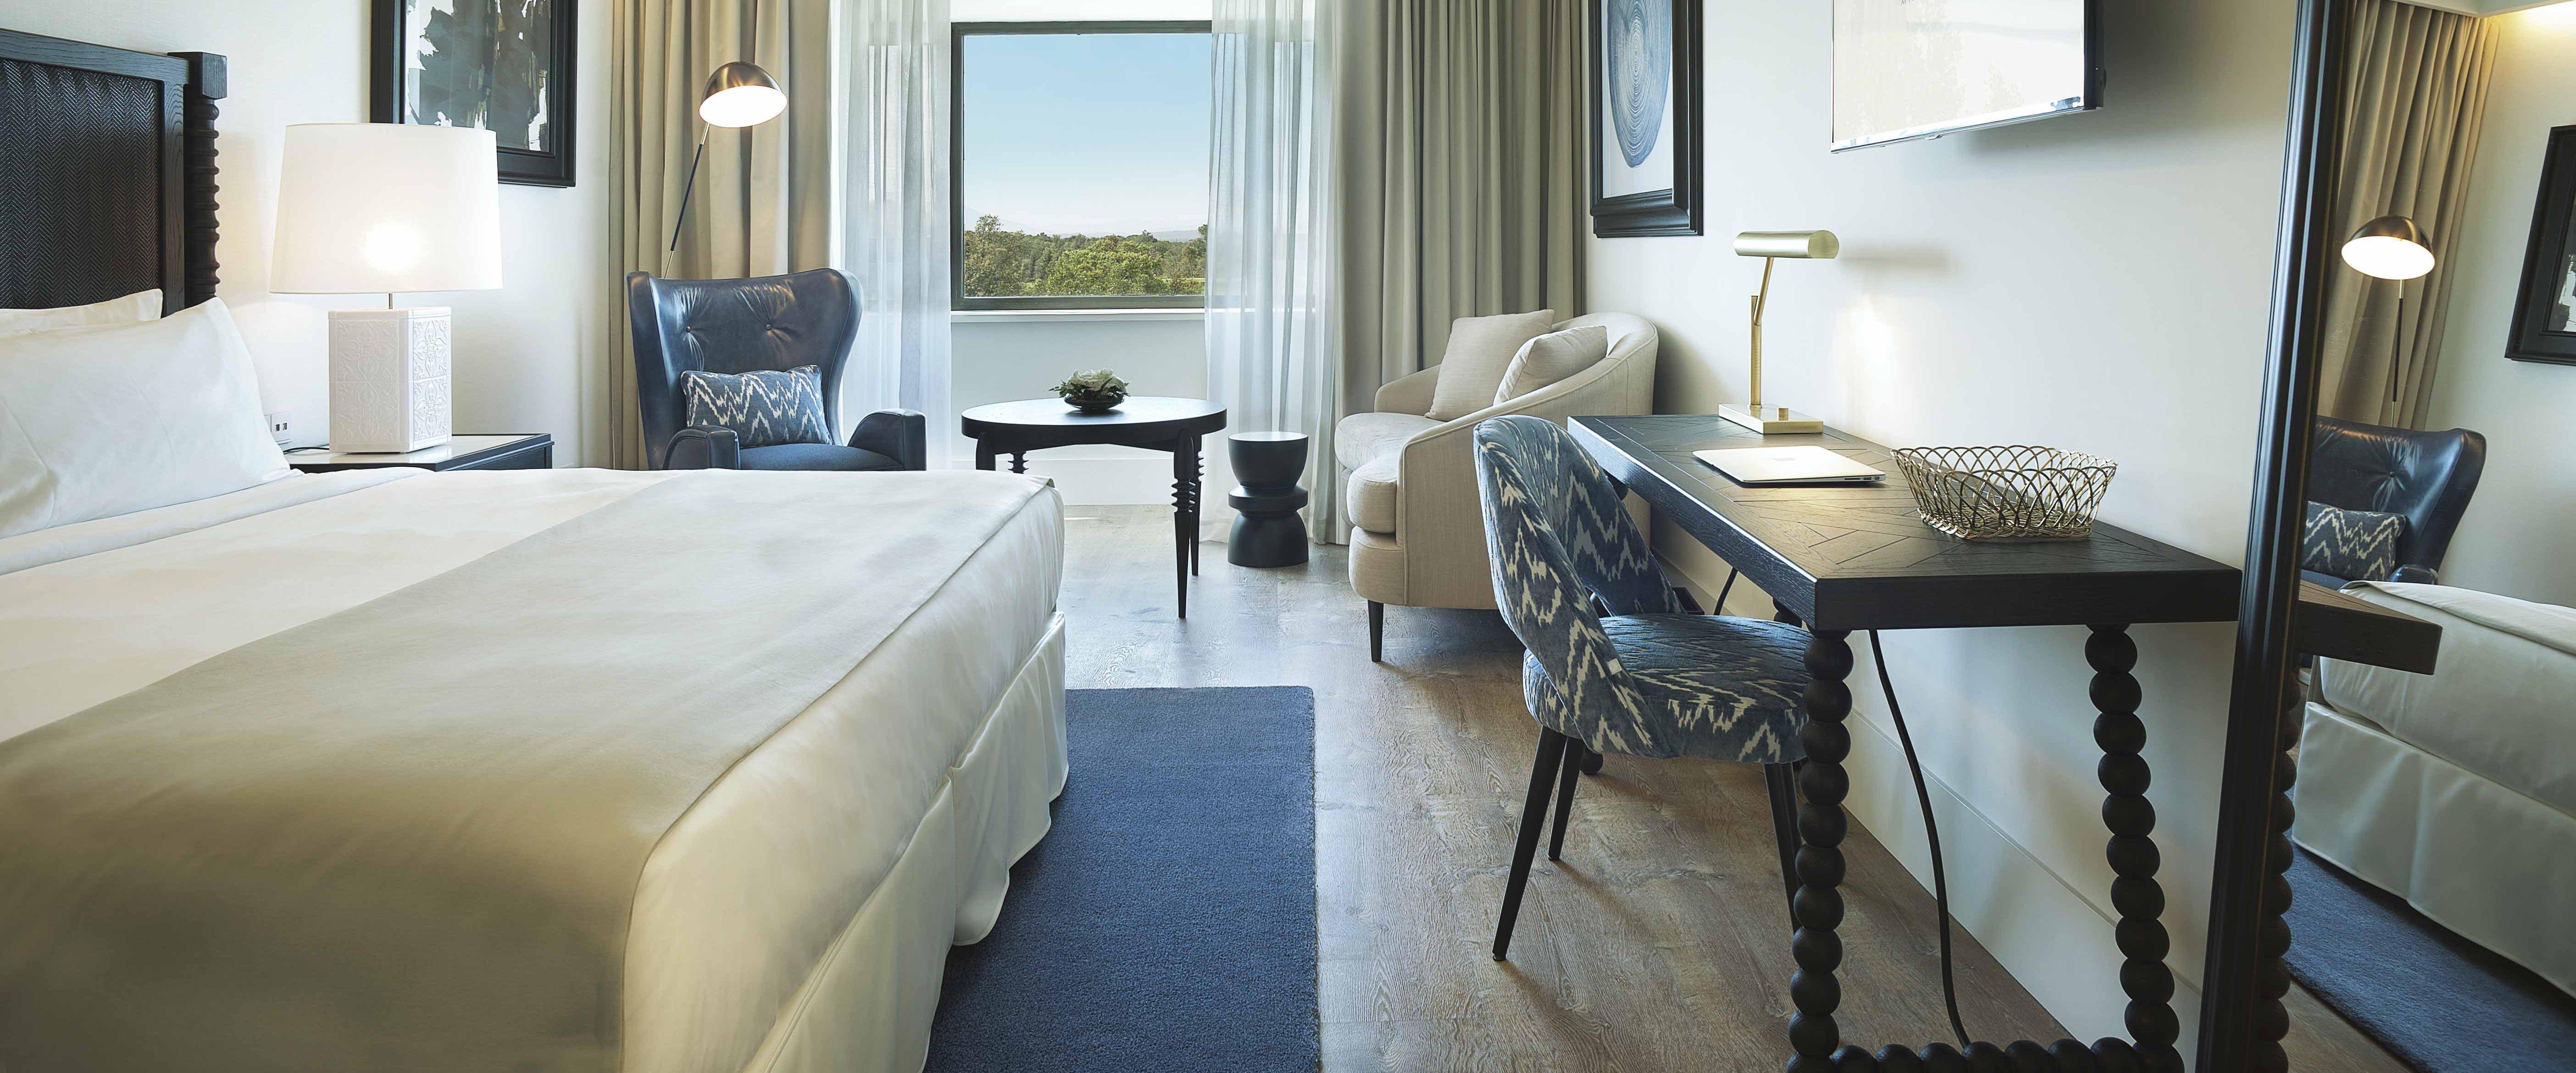 room hotel camiral